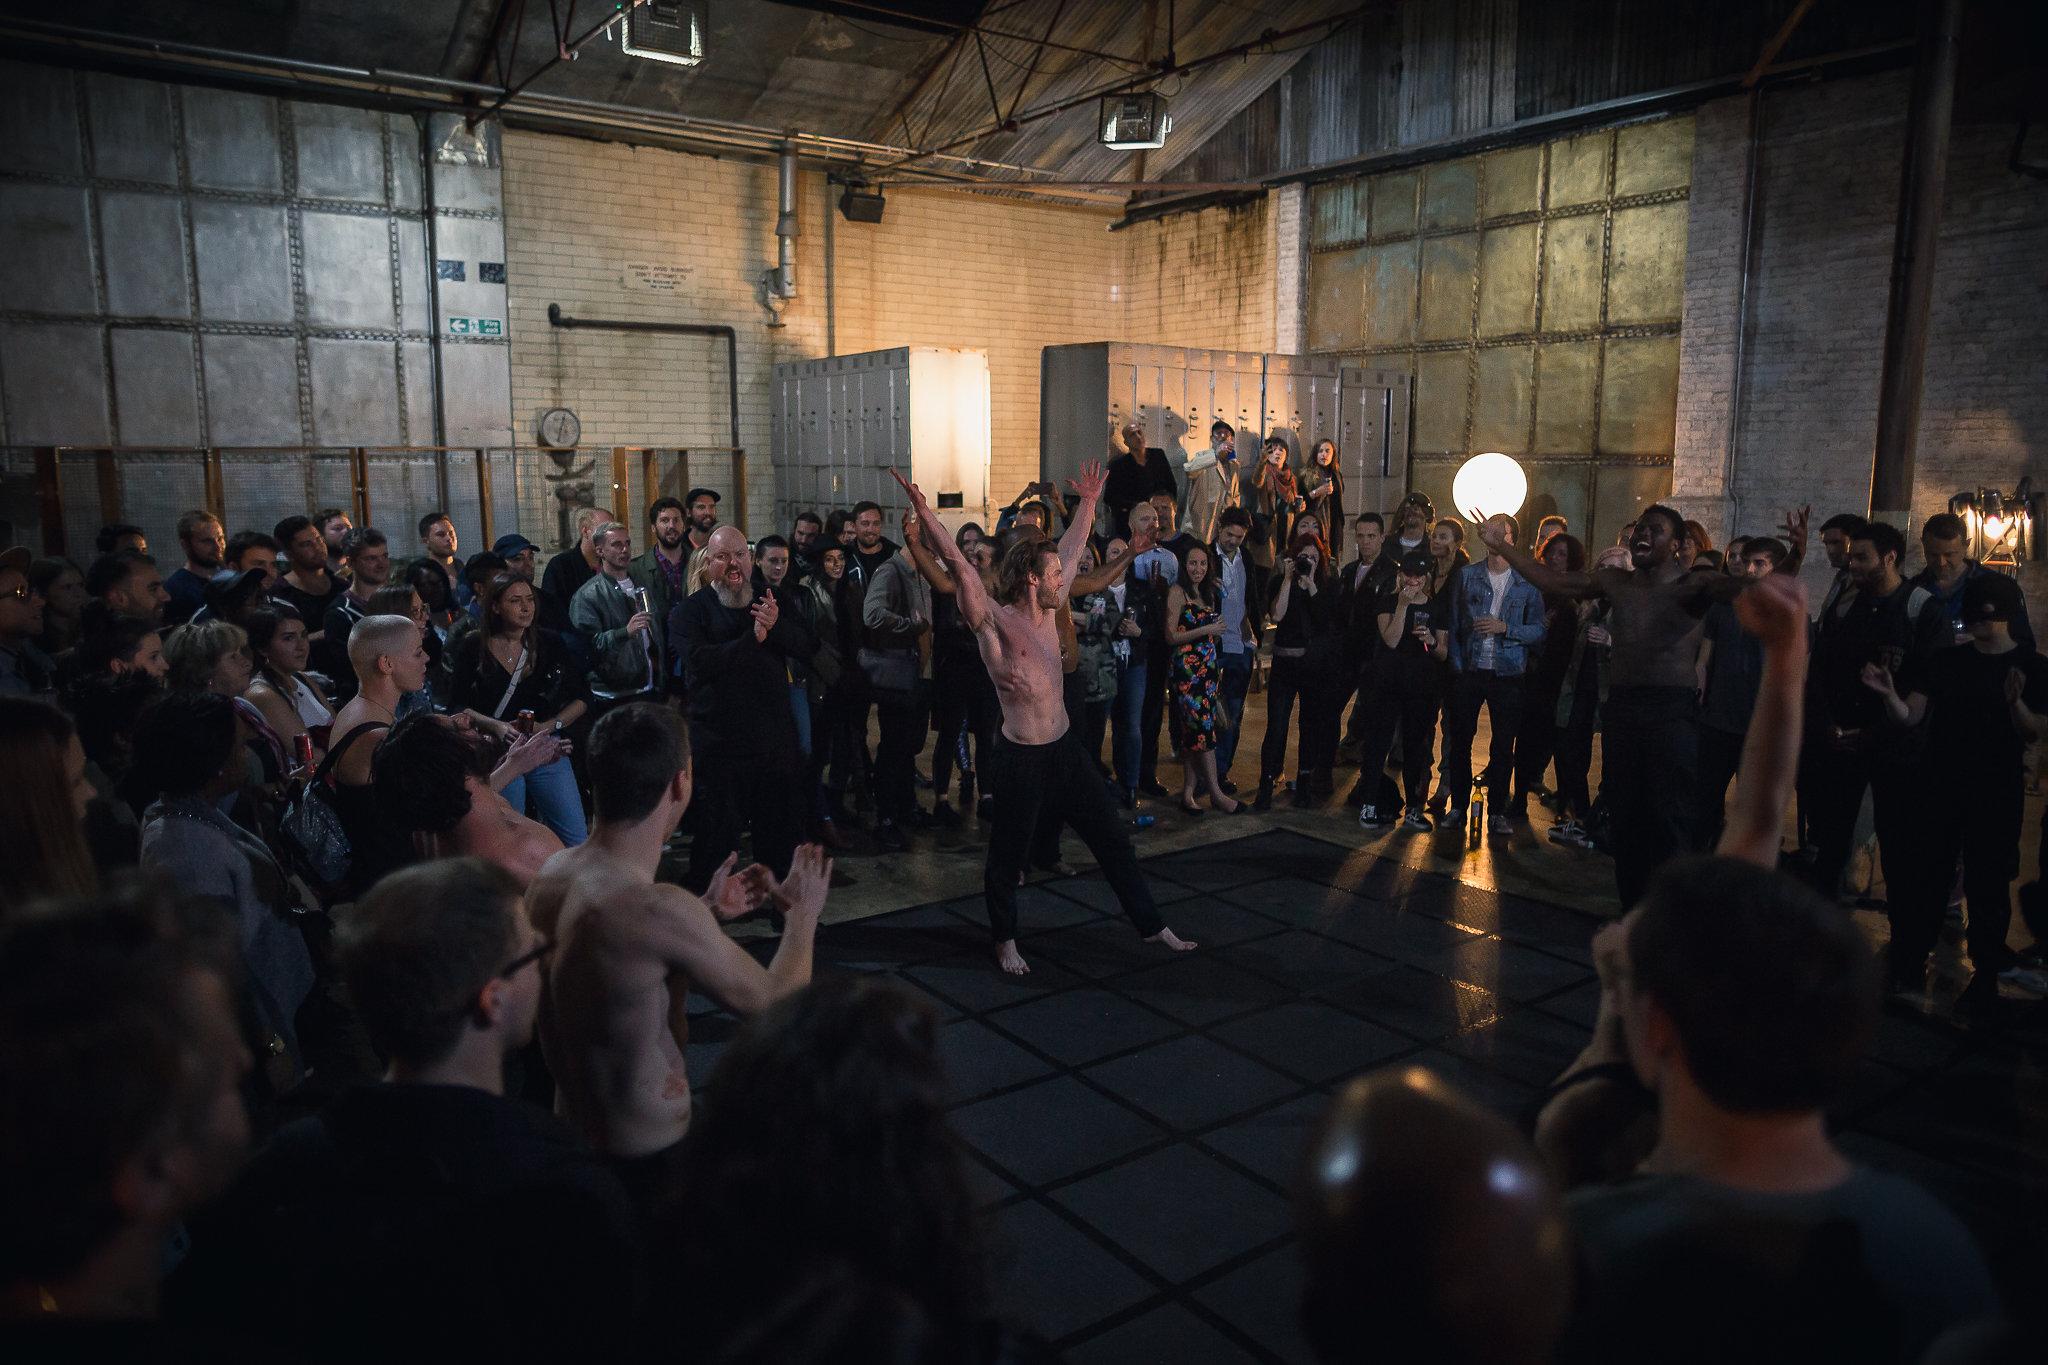 Project Mayhem gets into rhythm in Dalston's underbelly